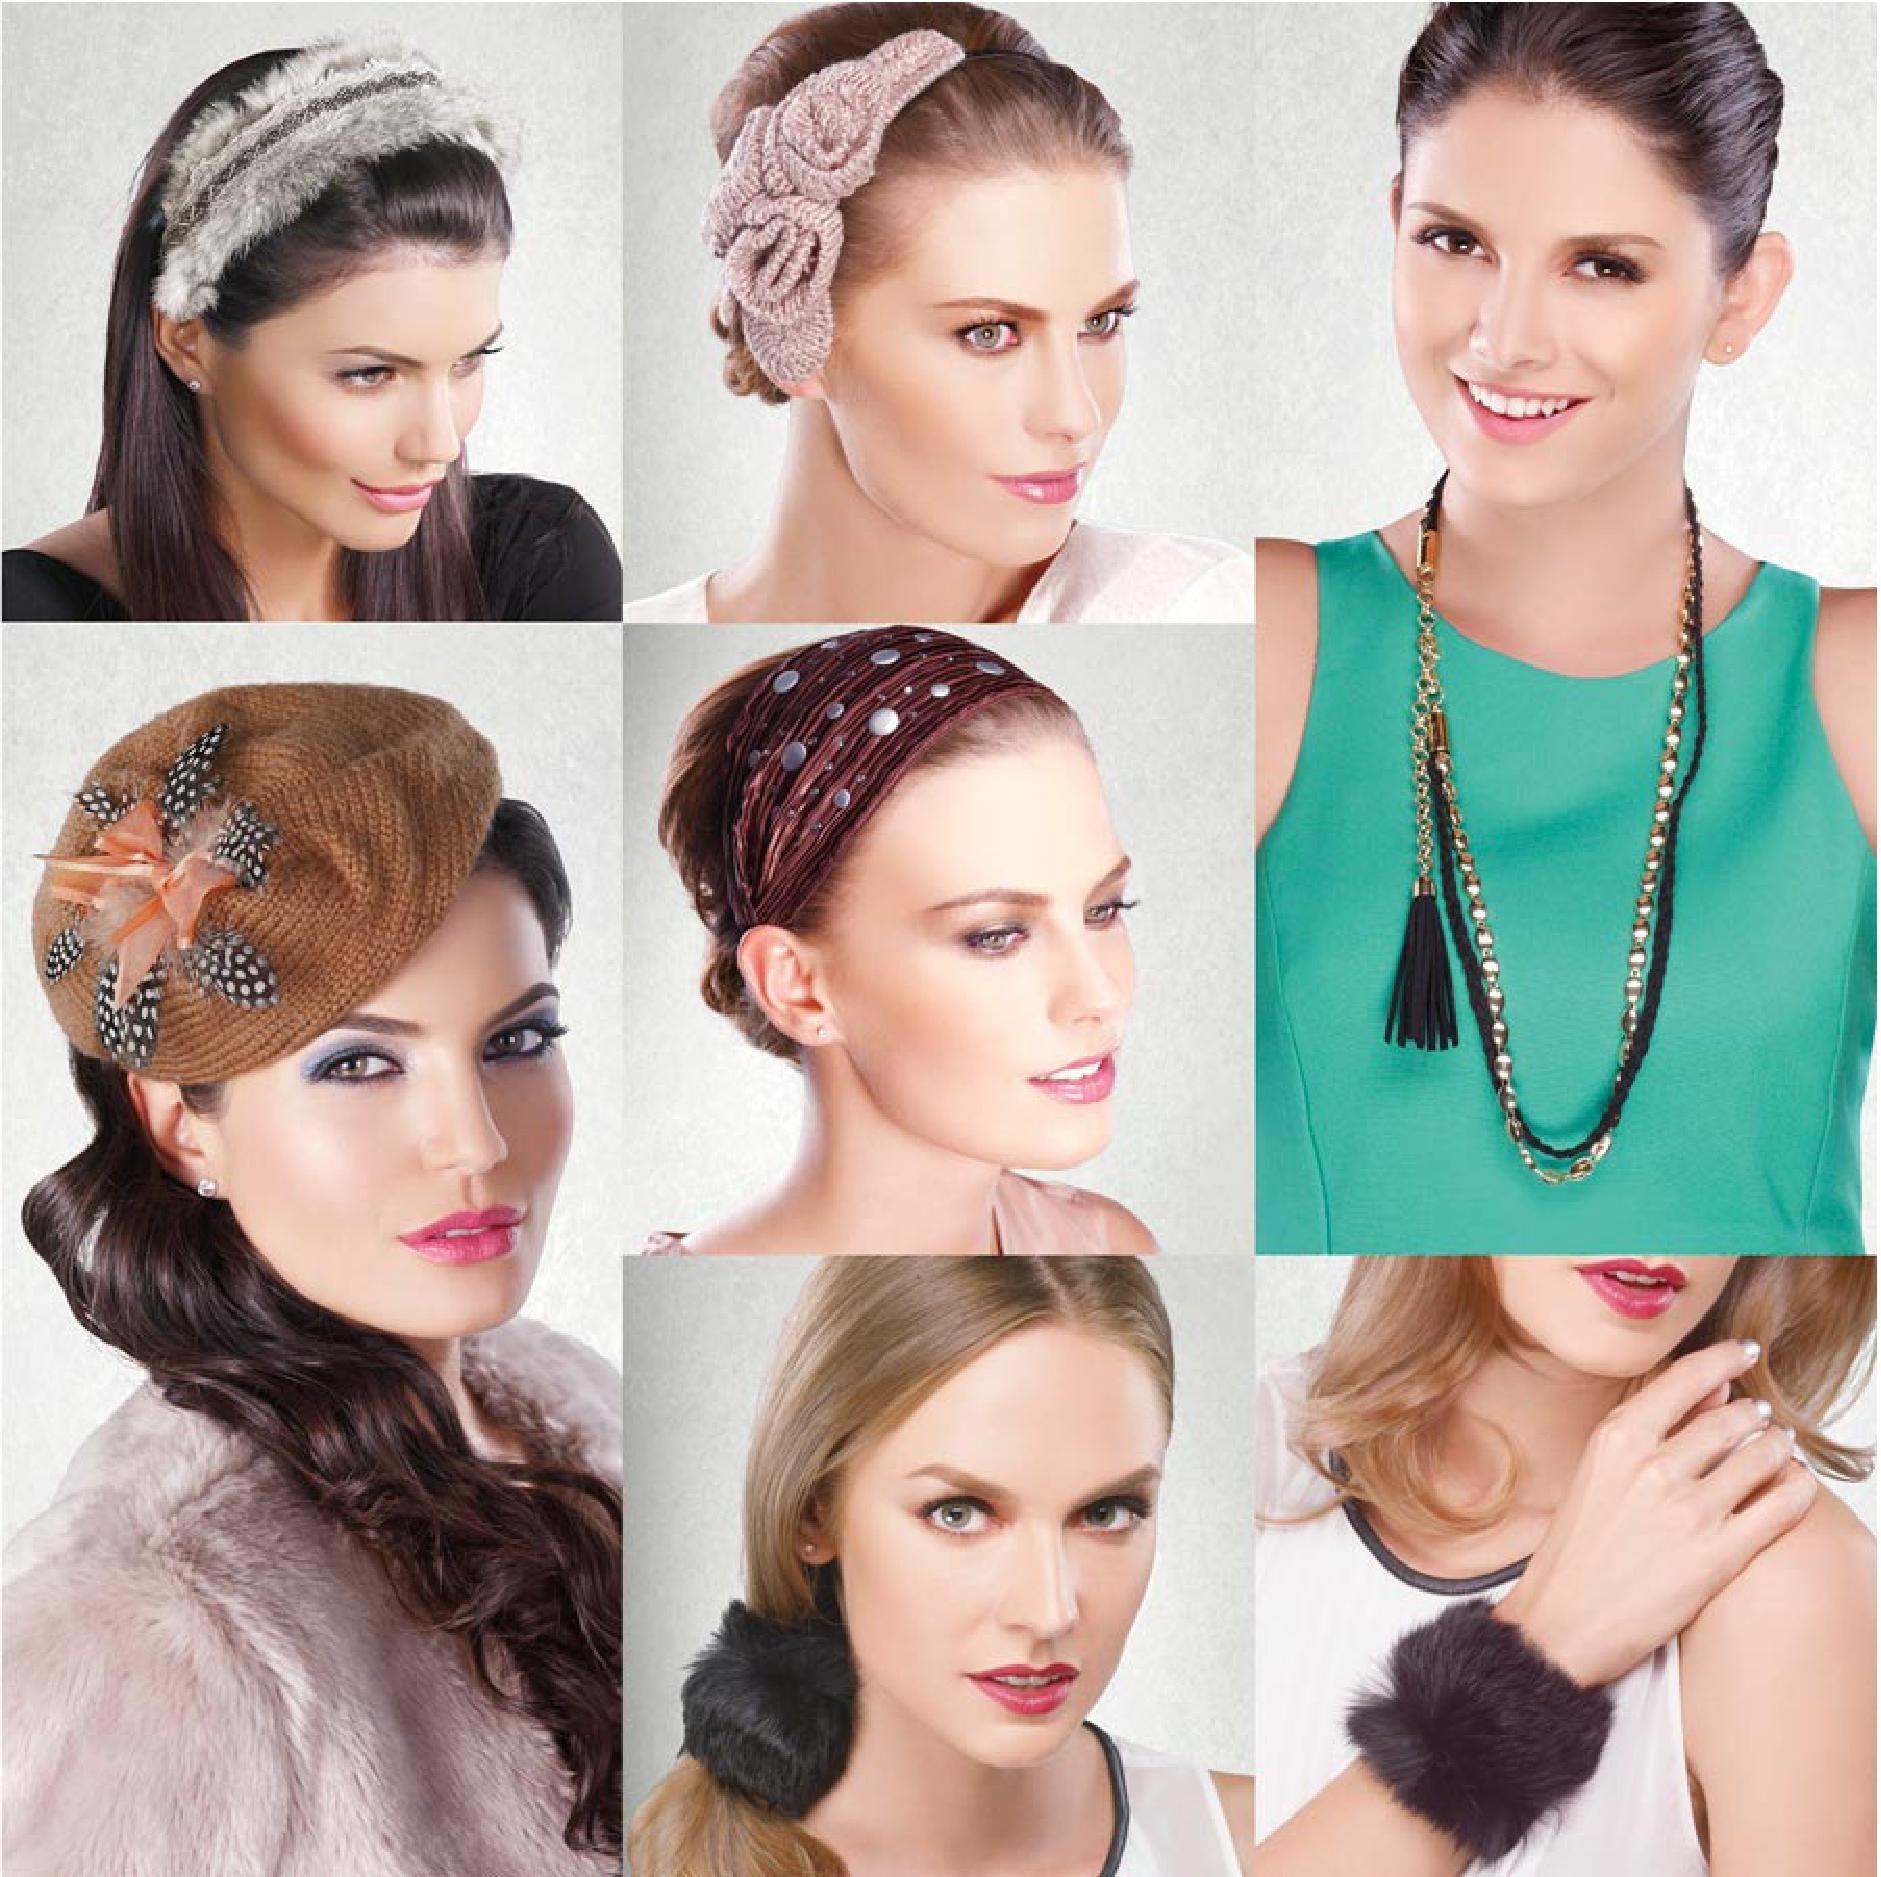 #Belleza #Andrea #Catalogo #Fashion #Monterrey